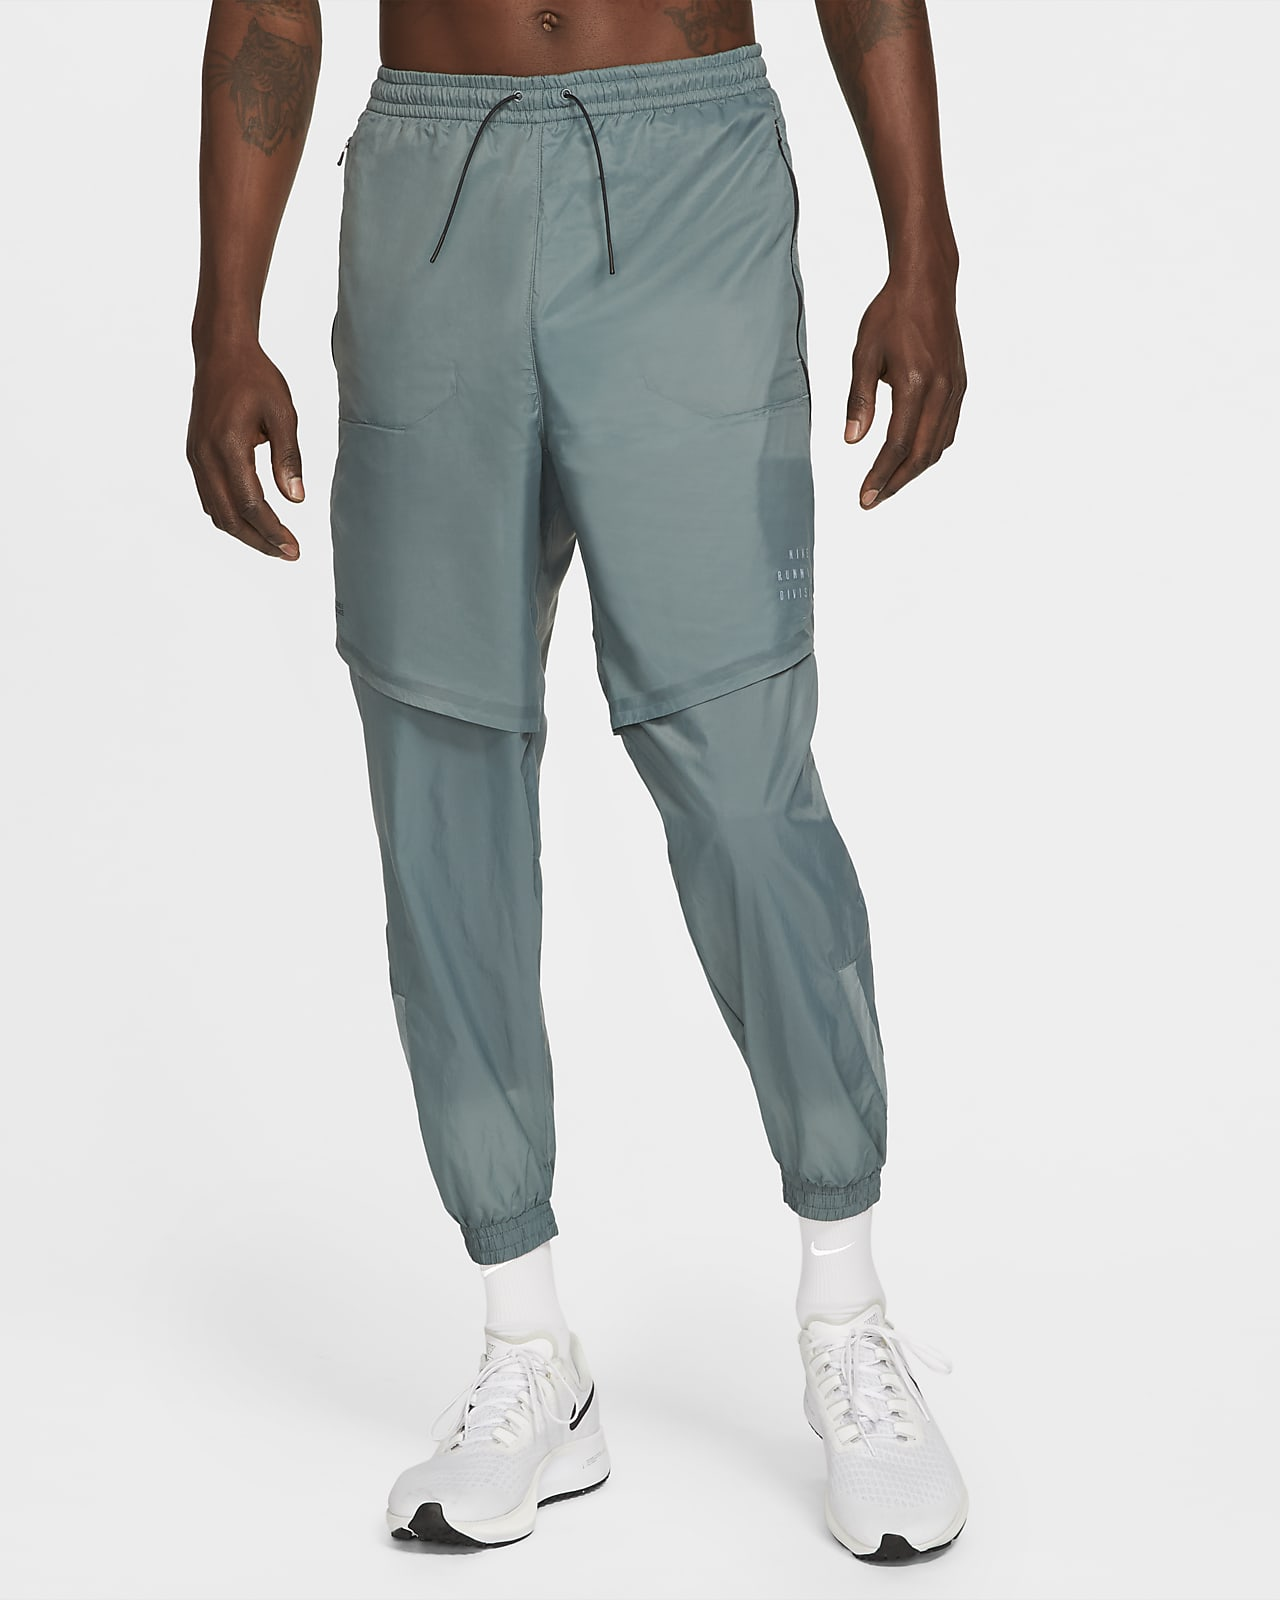 Nike Run Division Pinnacle Pantalons de running - Home